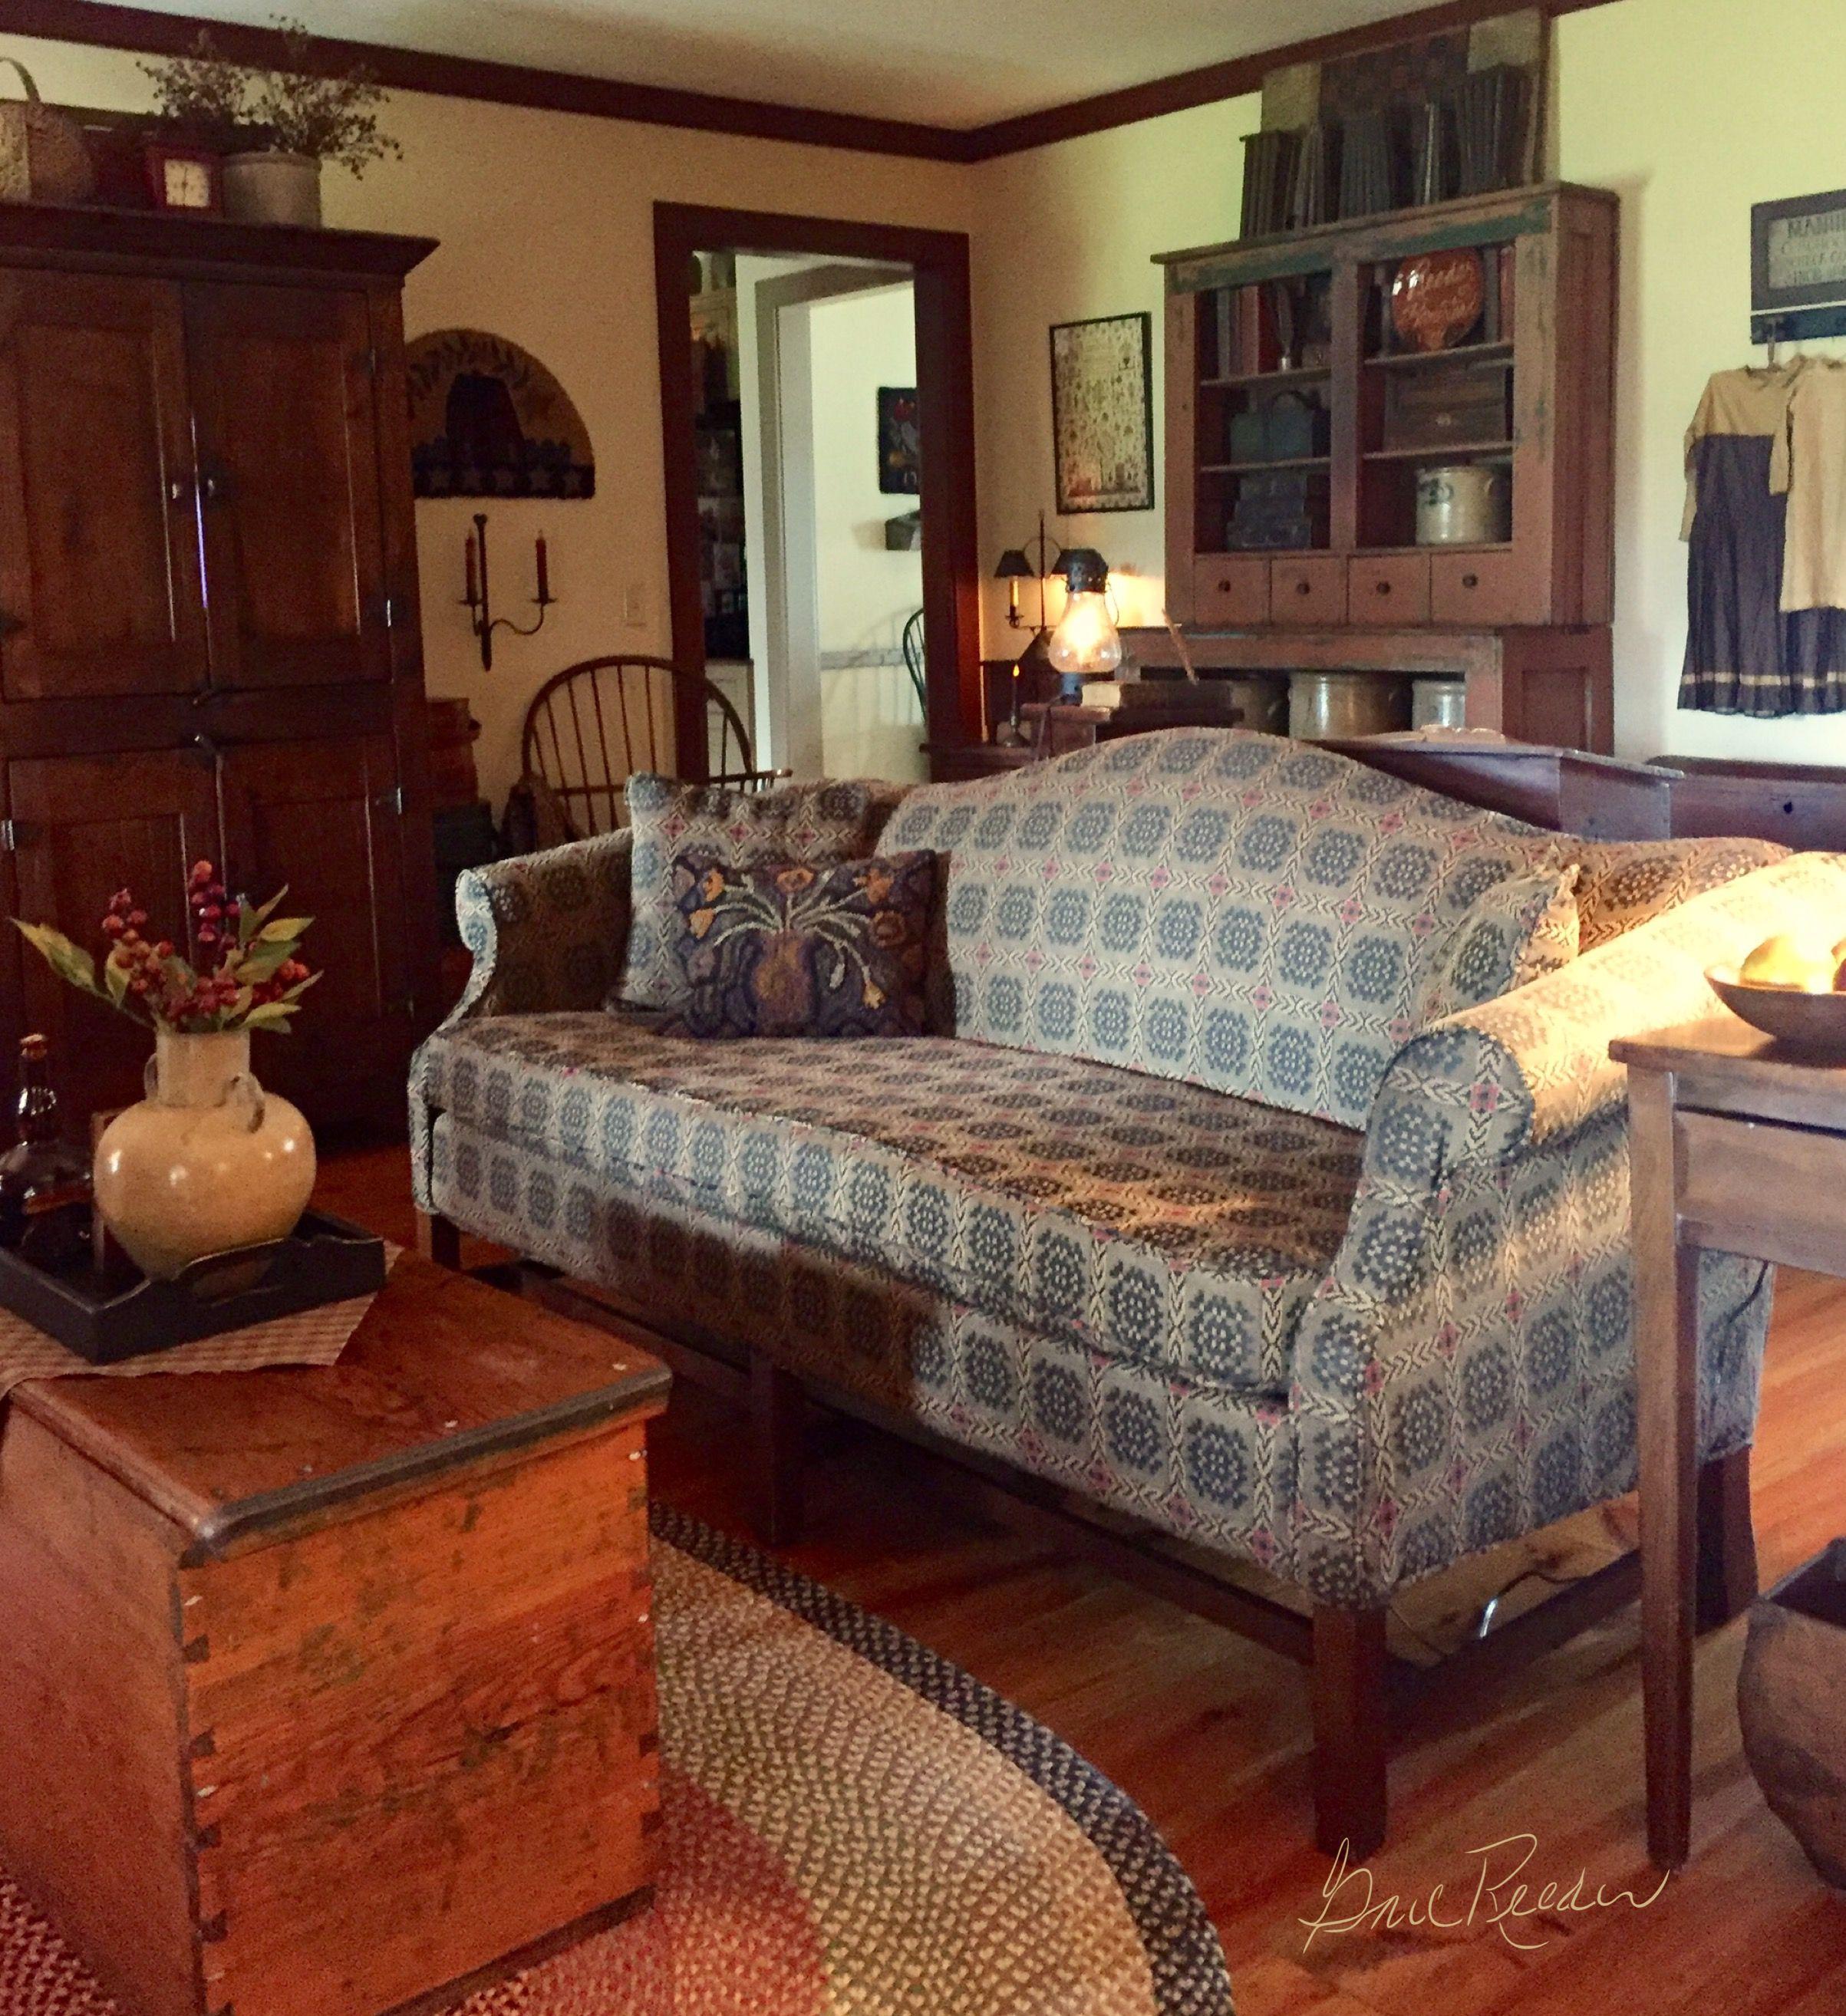 Colonial Sitting Room Primitivehomes Primitive Living Room Colonial Living Room Vintage Living Room #primitive #decor #living #room